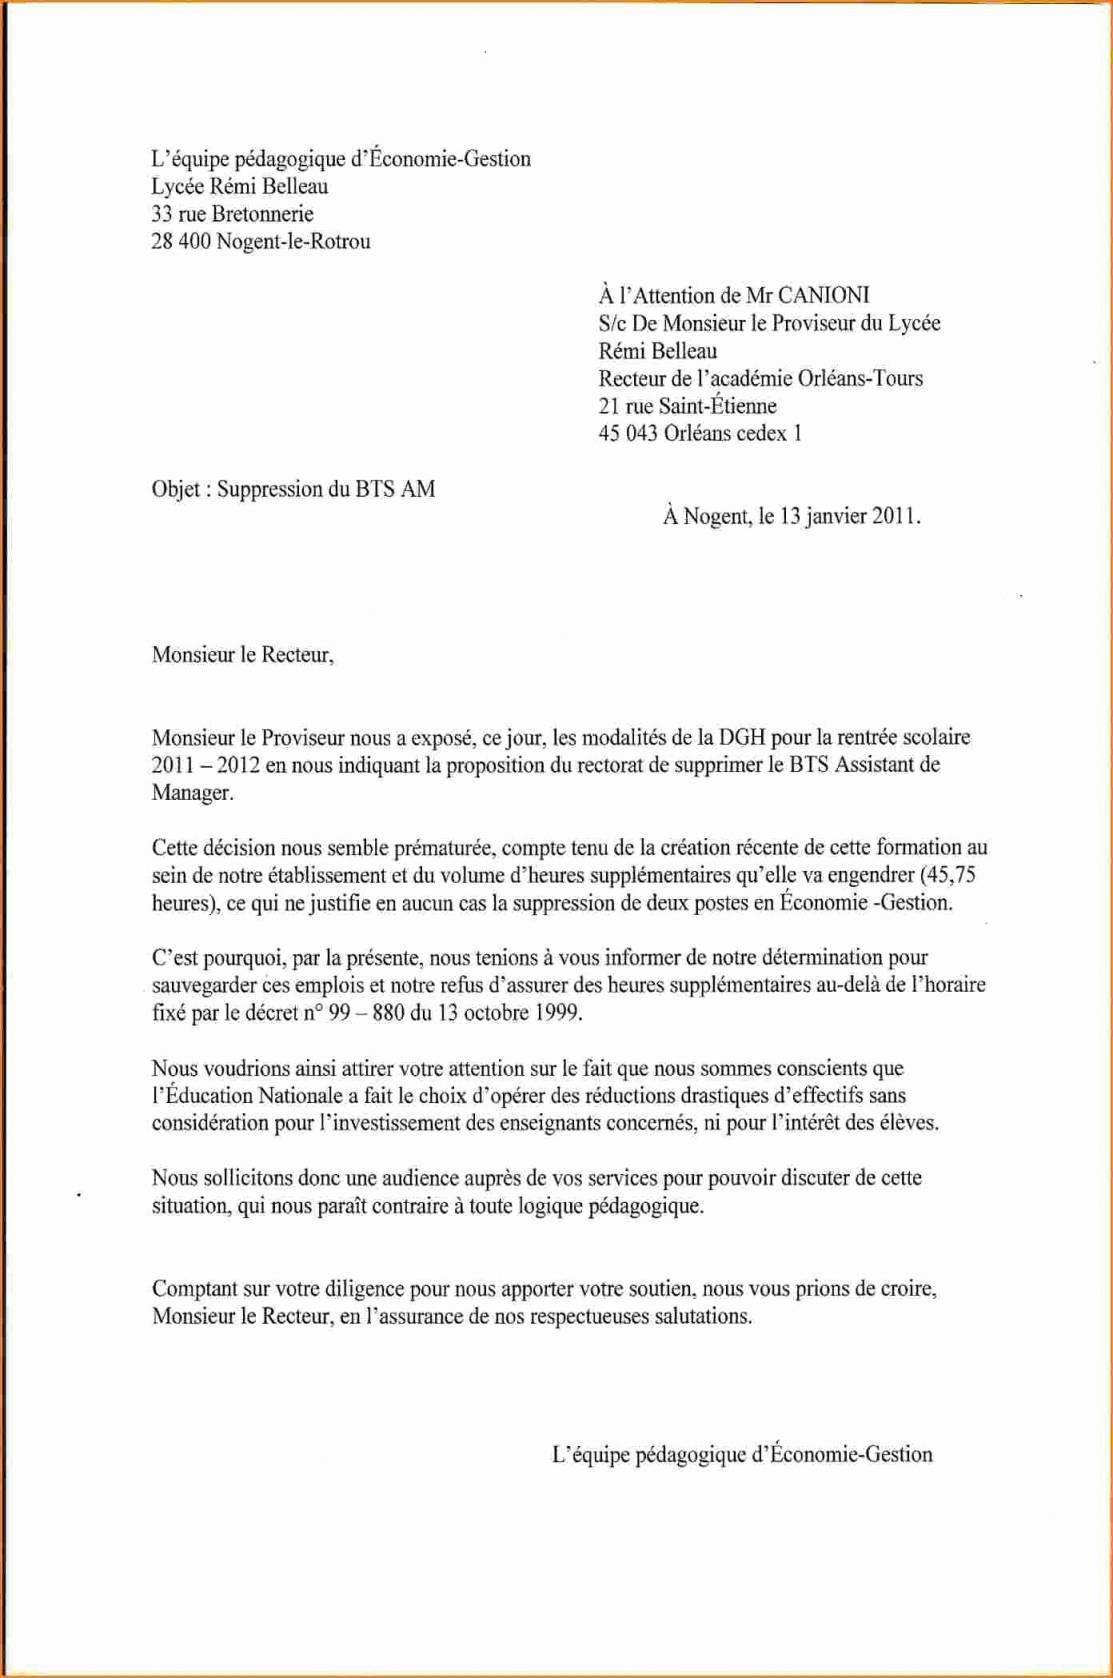 lettre de motivation alternance master finance